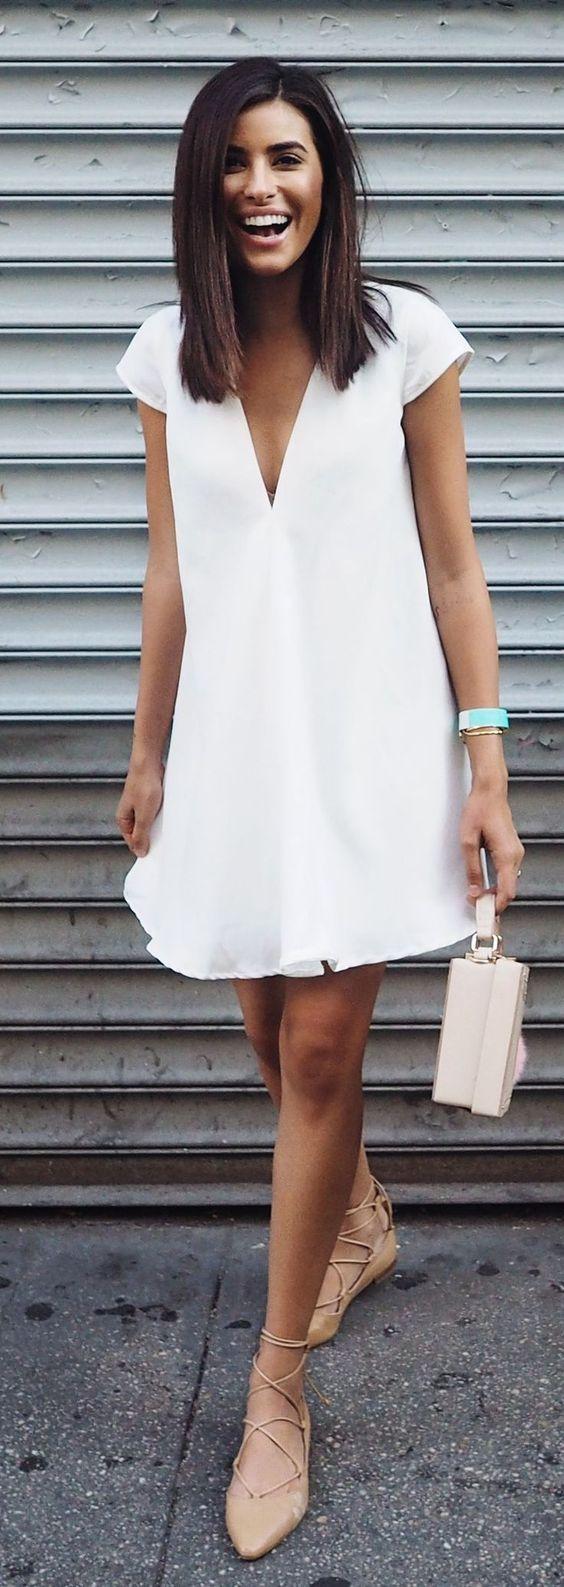 Ideas de looks para que cada vez que salgas de fiesta, tus outfits te acomoden y luzcan súper stylish.